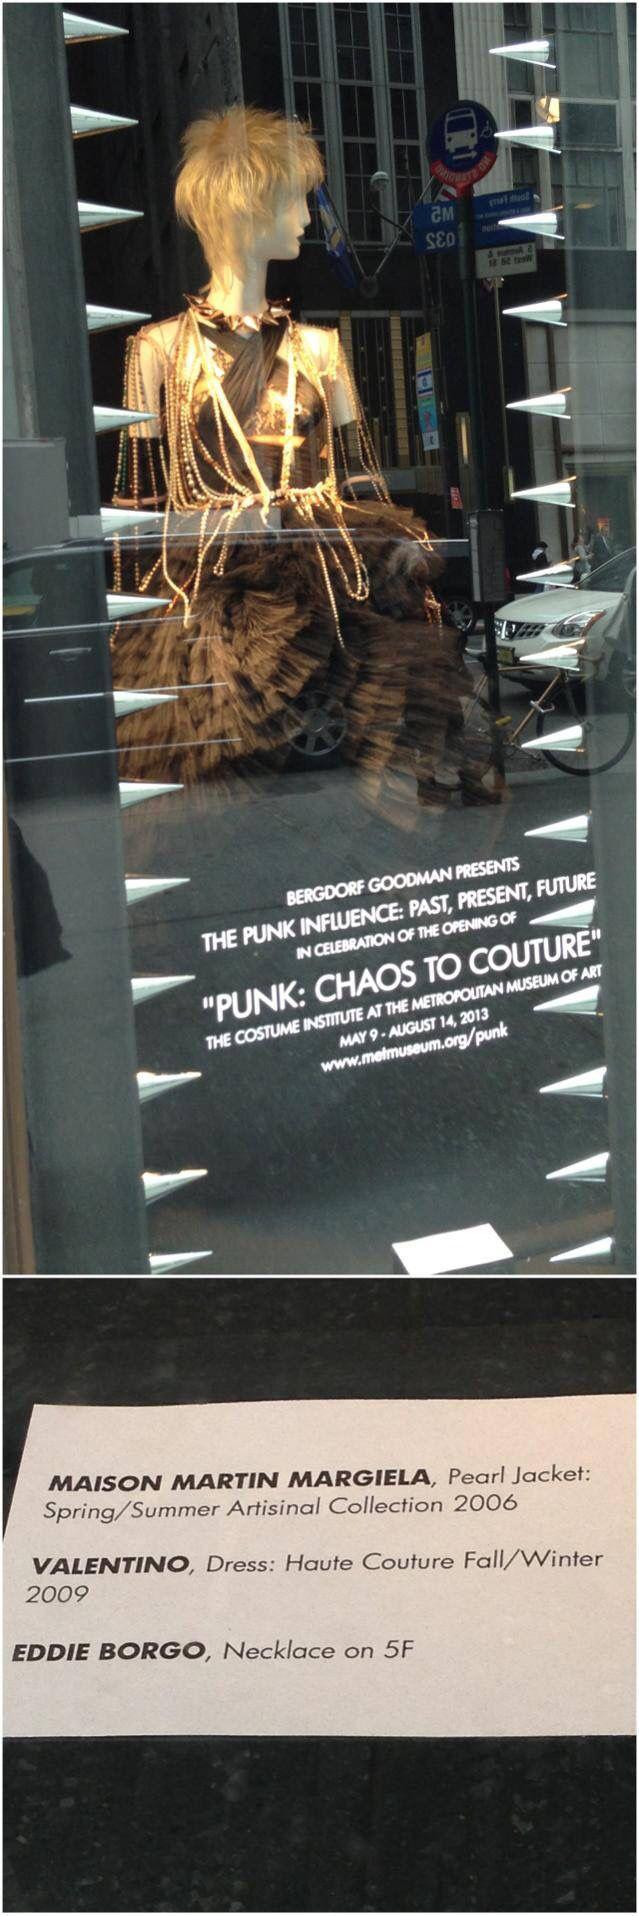 Shopwindow -> MMA New York - 'Punk-Chaos to Couture' (2013-05-14) - Fashion Exhibition